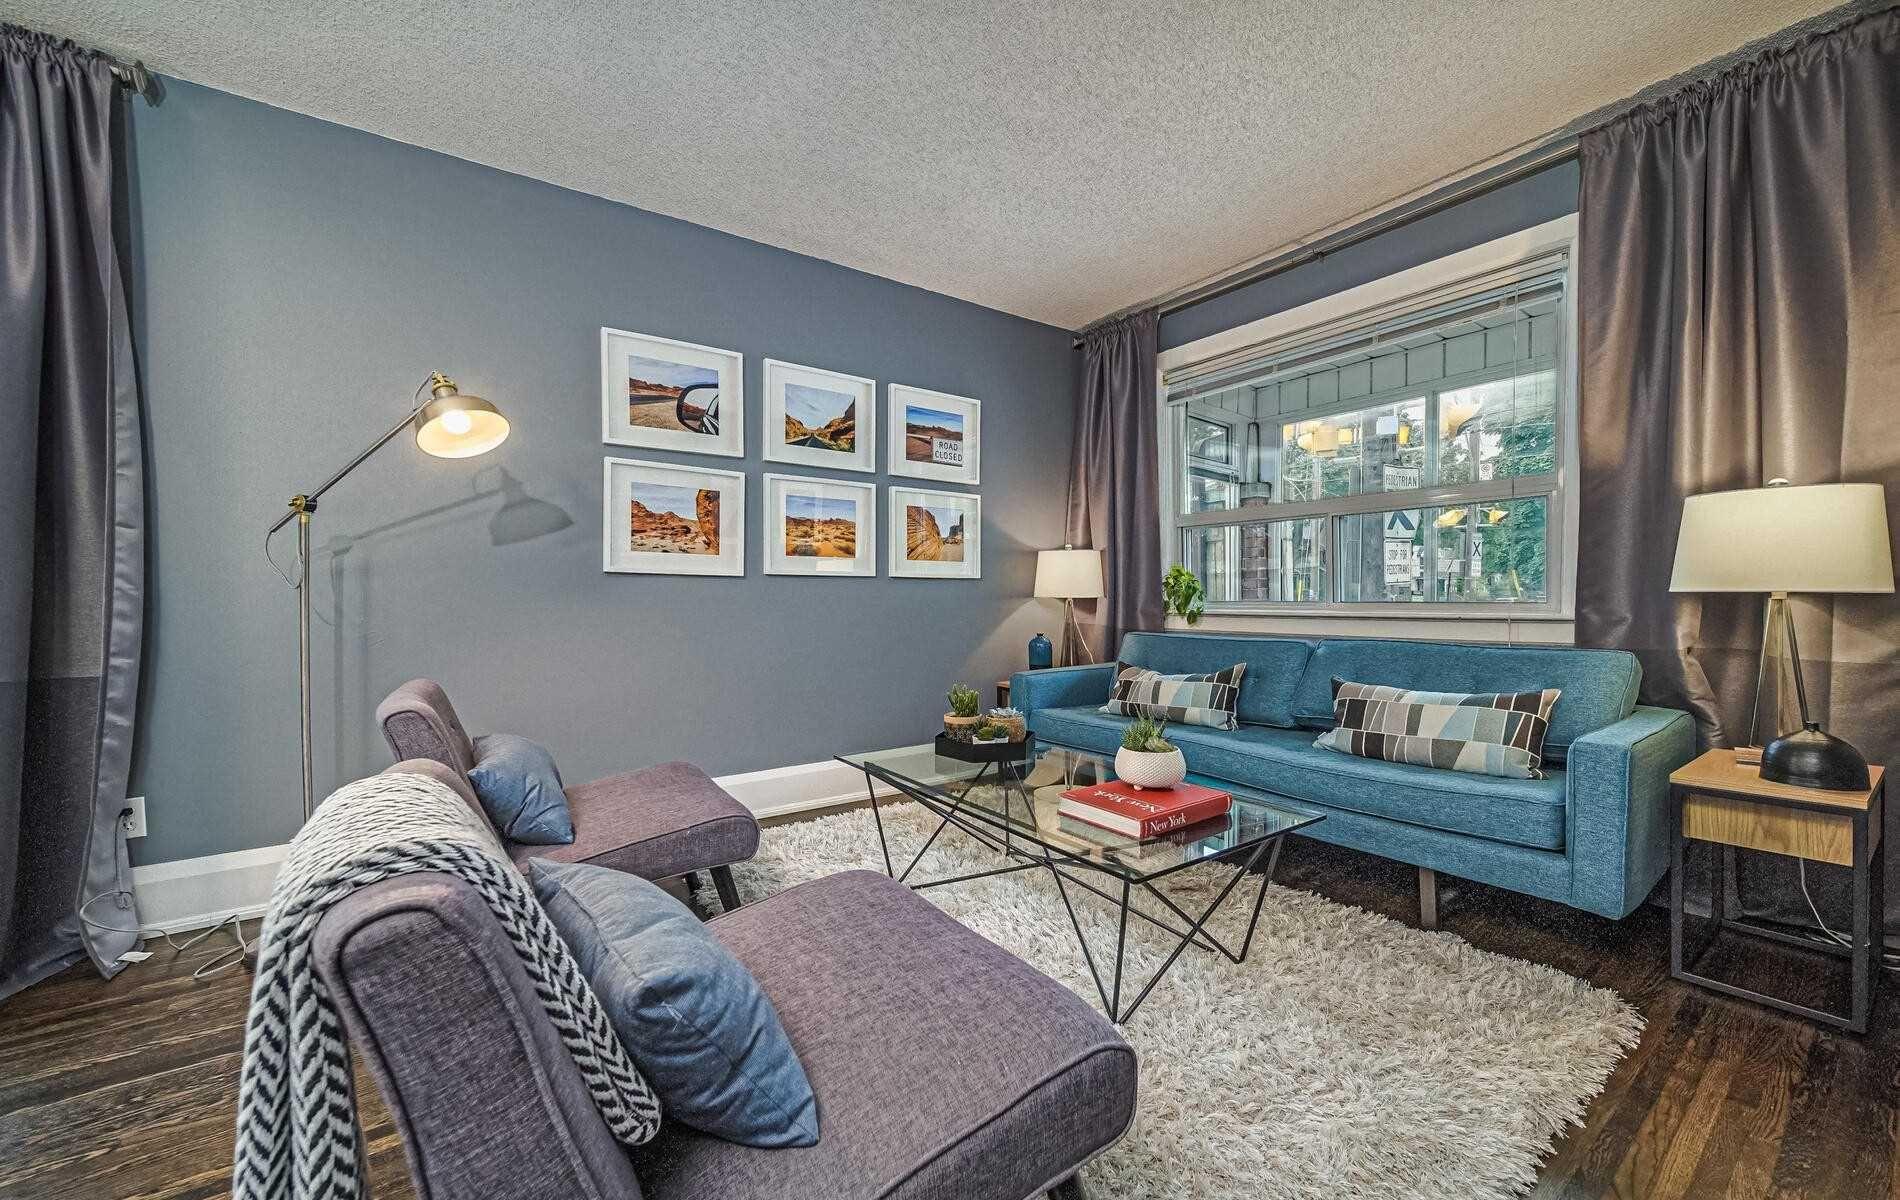 Main Photo: 1589 E Dundas Street in Toronto: Greenwood-Coxwell House (2-Storey) for sale (Toronto E01)  : MLS®# E4914218